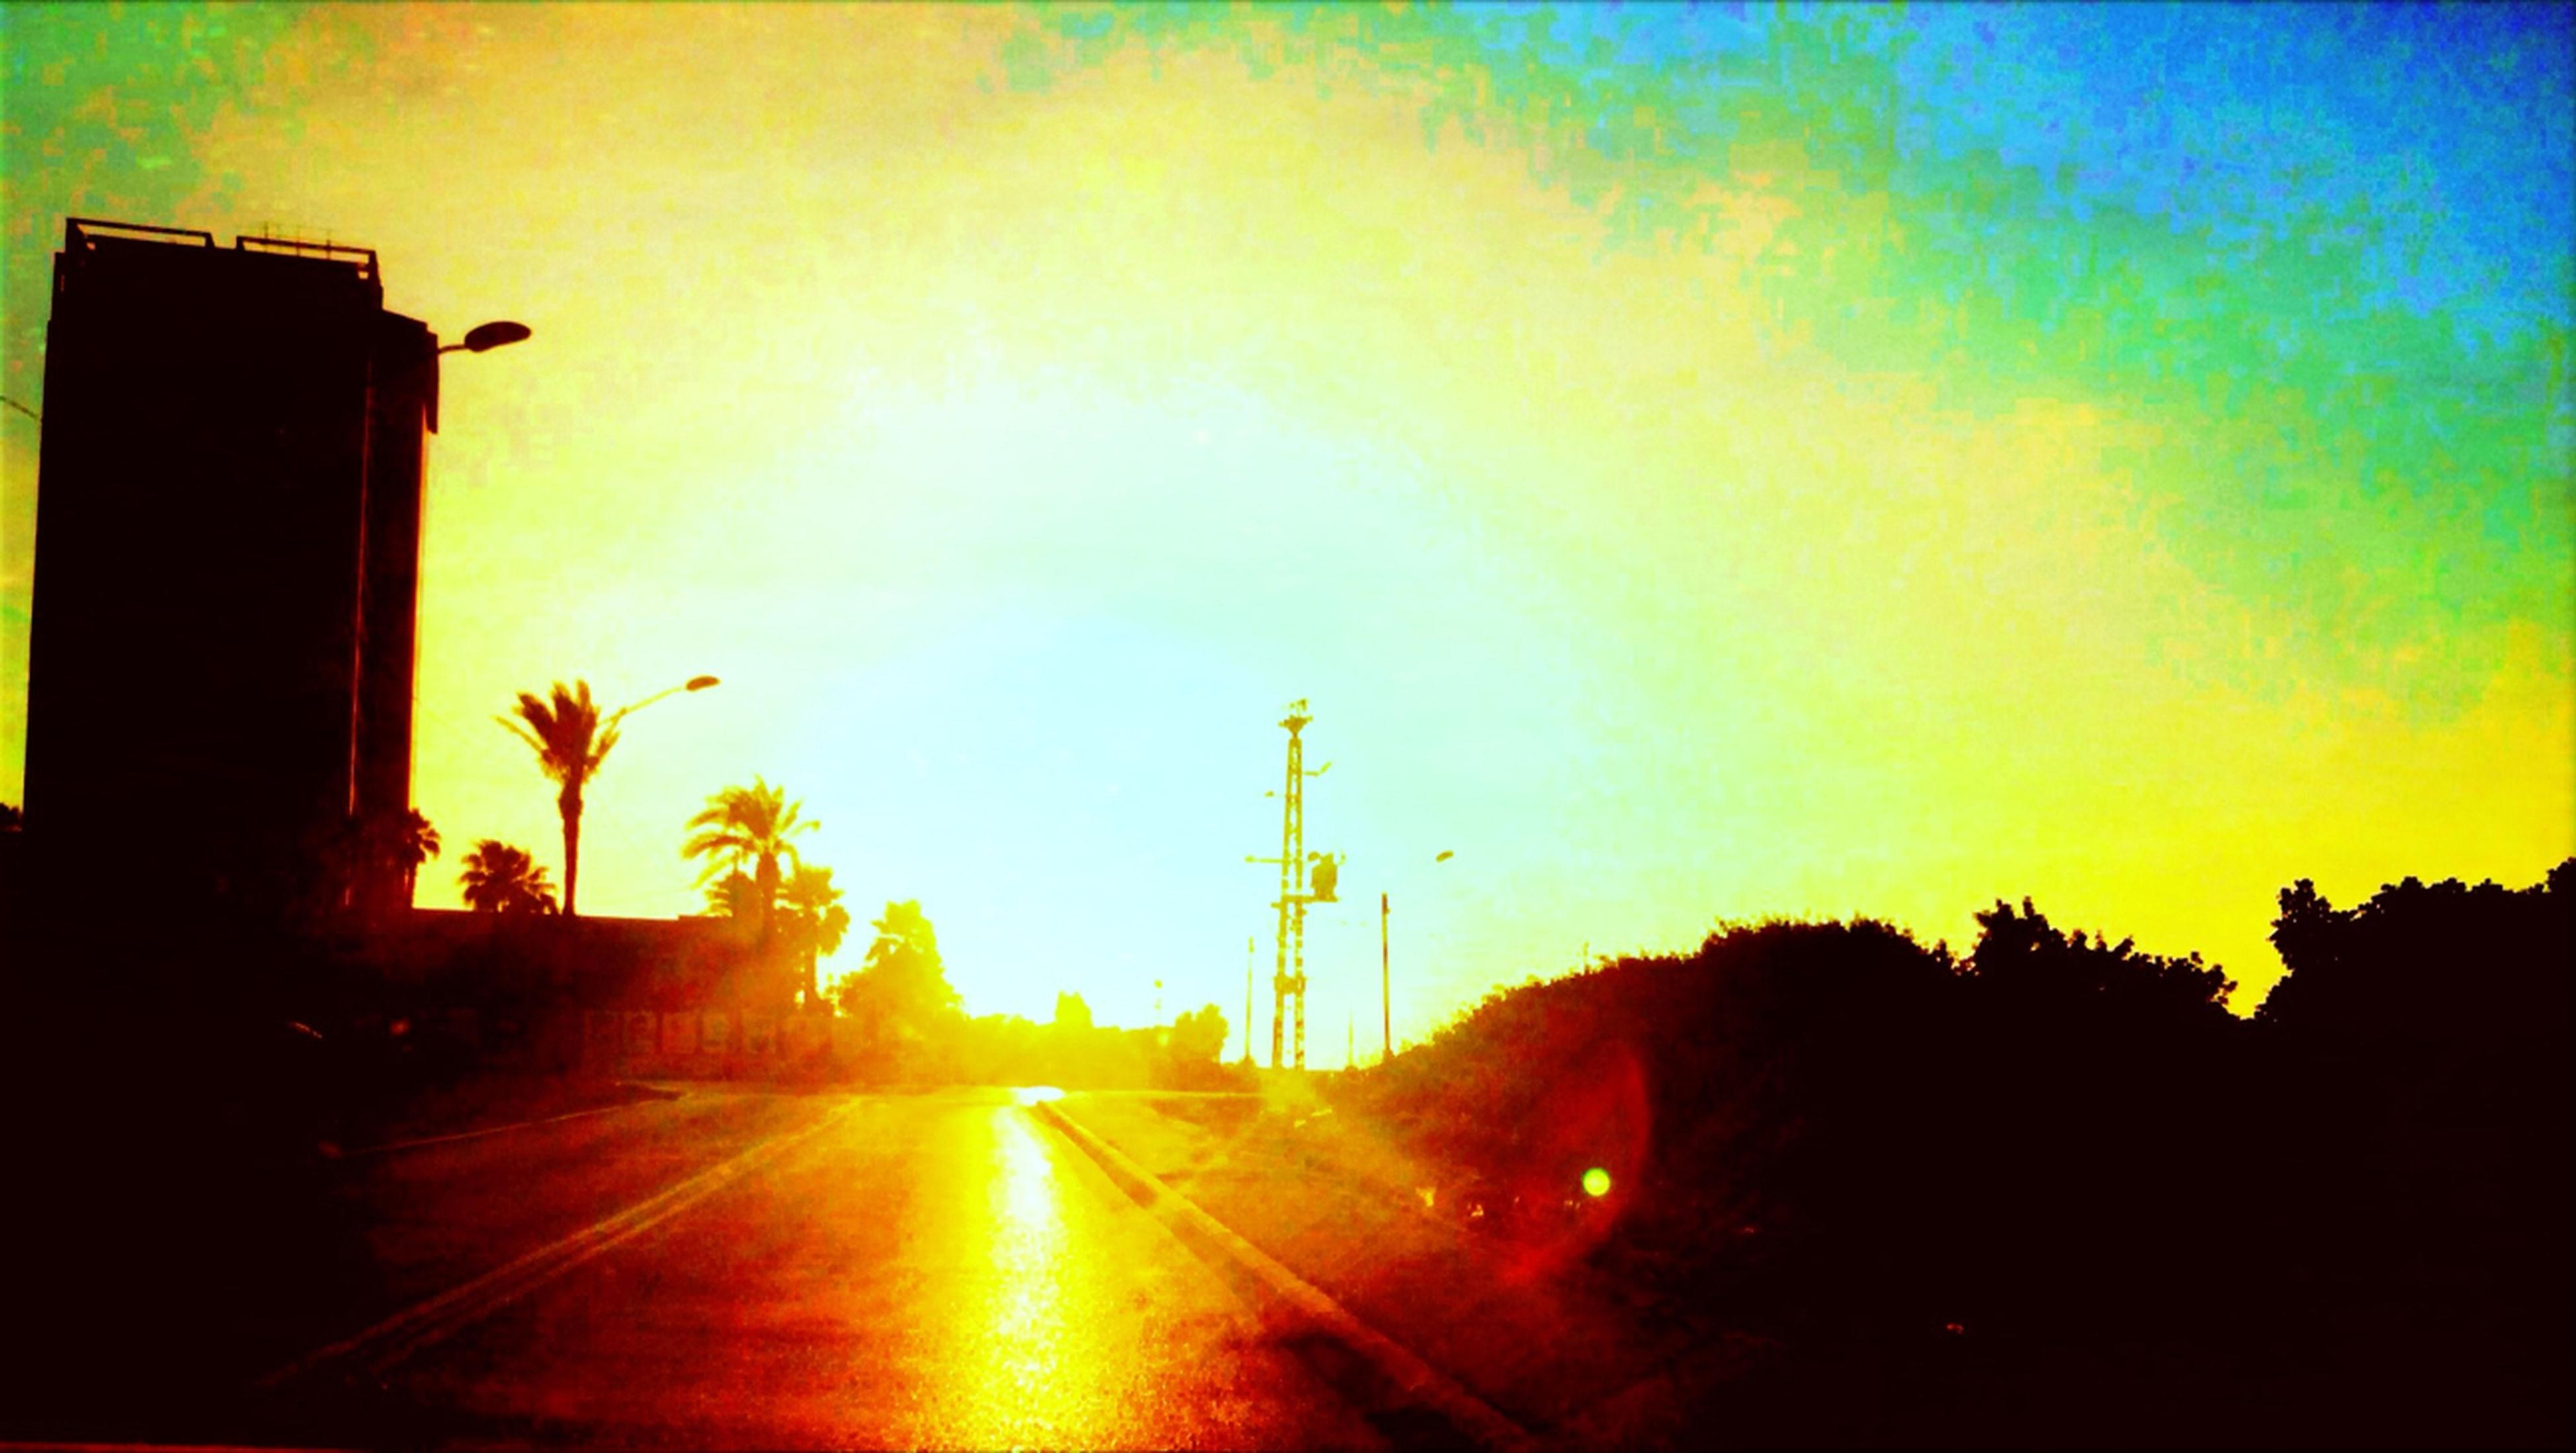 sunset, silhouette, sun, sky, building exterior, built structure, road, architecture, sunlight, the way forward, street light, sunbeam, orange color, street, lens flare, transportation, cloud - sky, tree, nature, outdoors